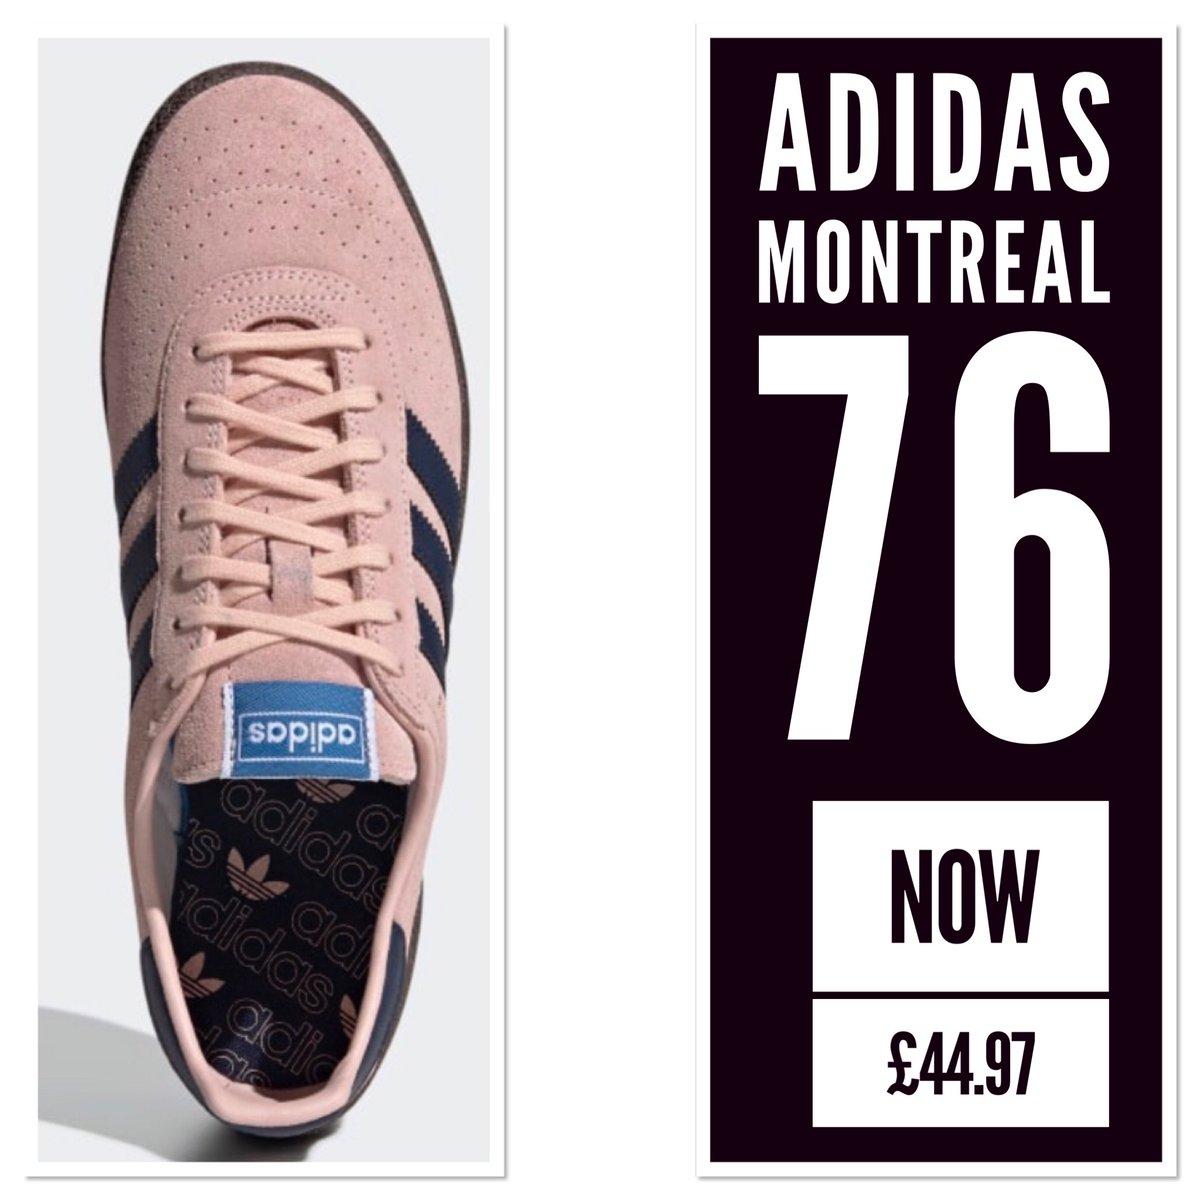 d5RYGs5xhQ Adidas Montreal 76 Reduced